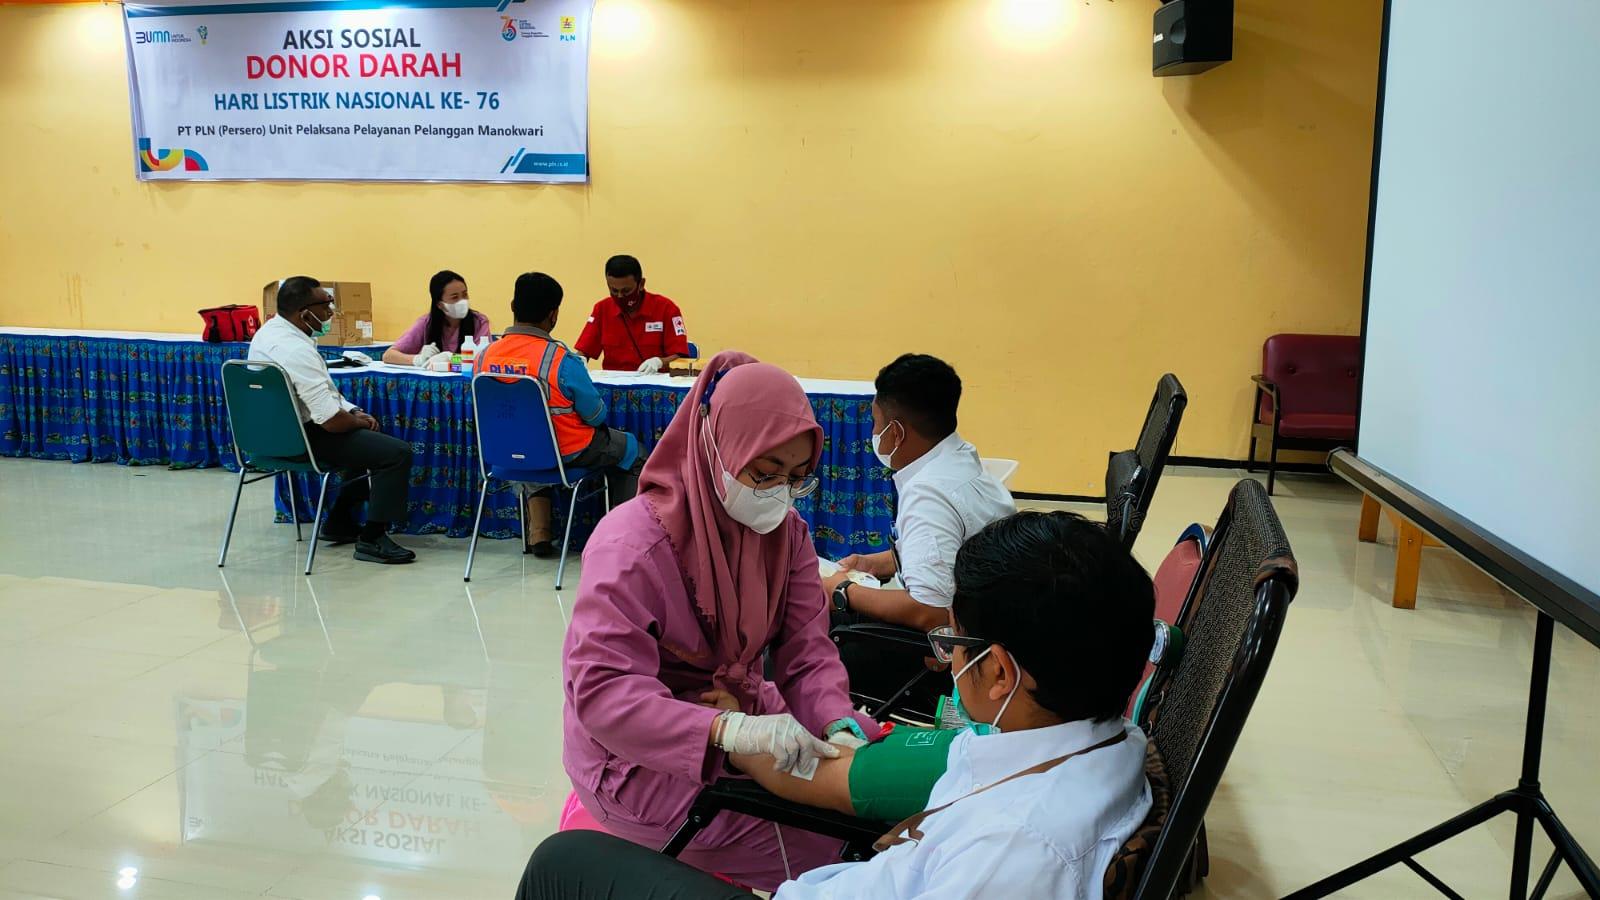 Aksi sosial donor darah kerjasama PLN Manokwari dan PMI